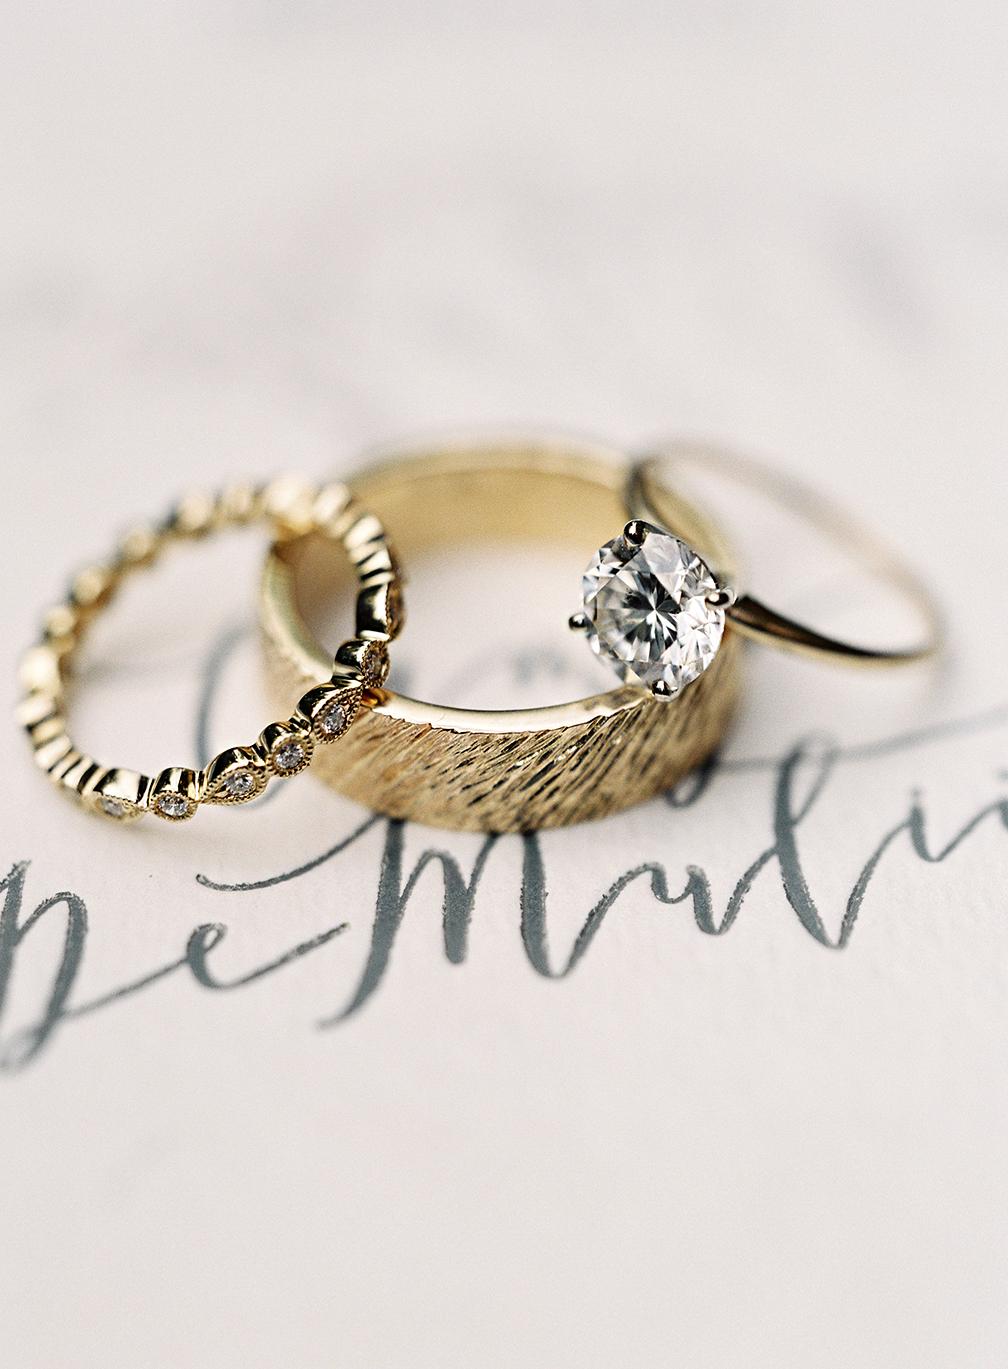 ashley and justin wedding rings